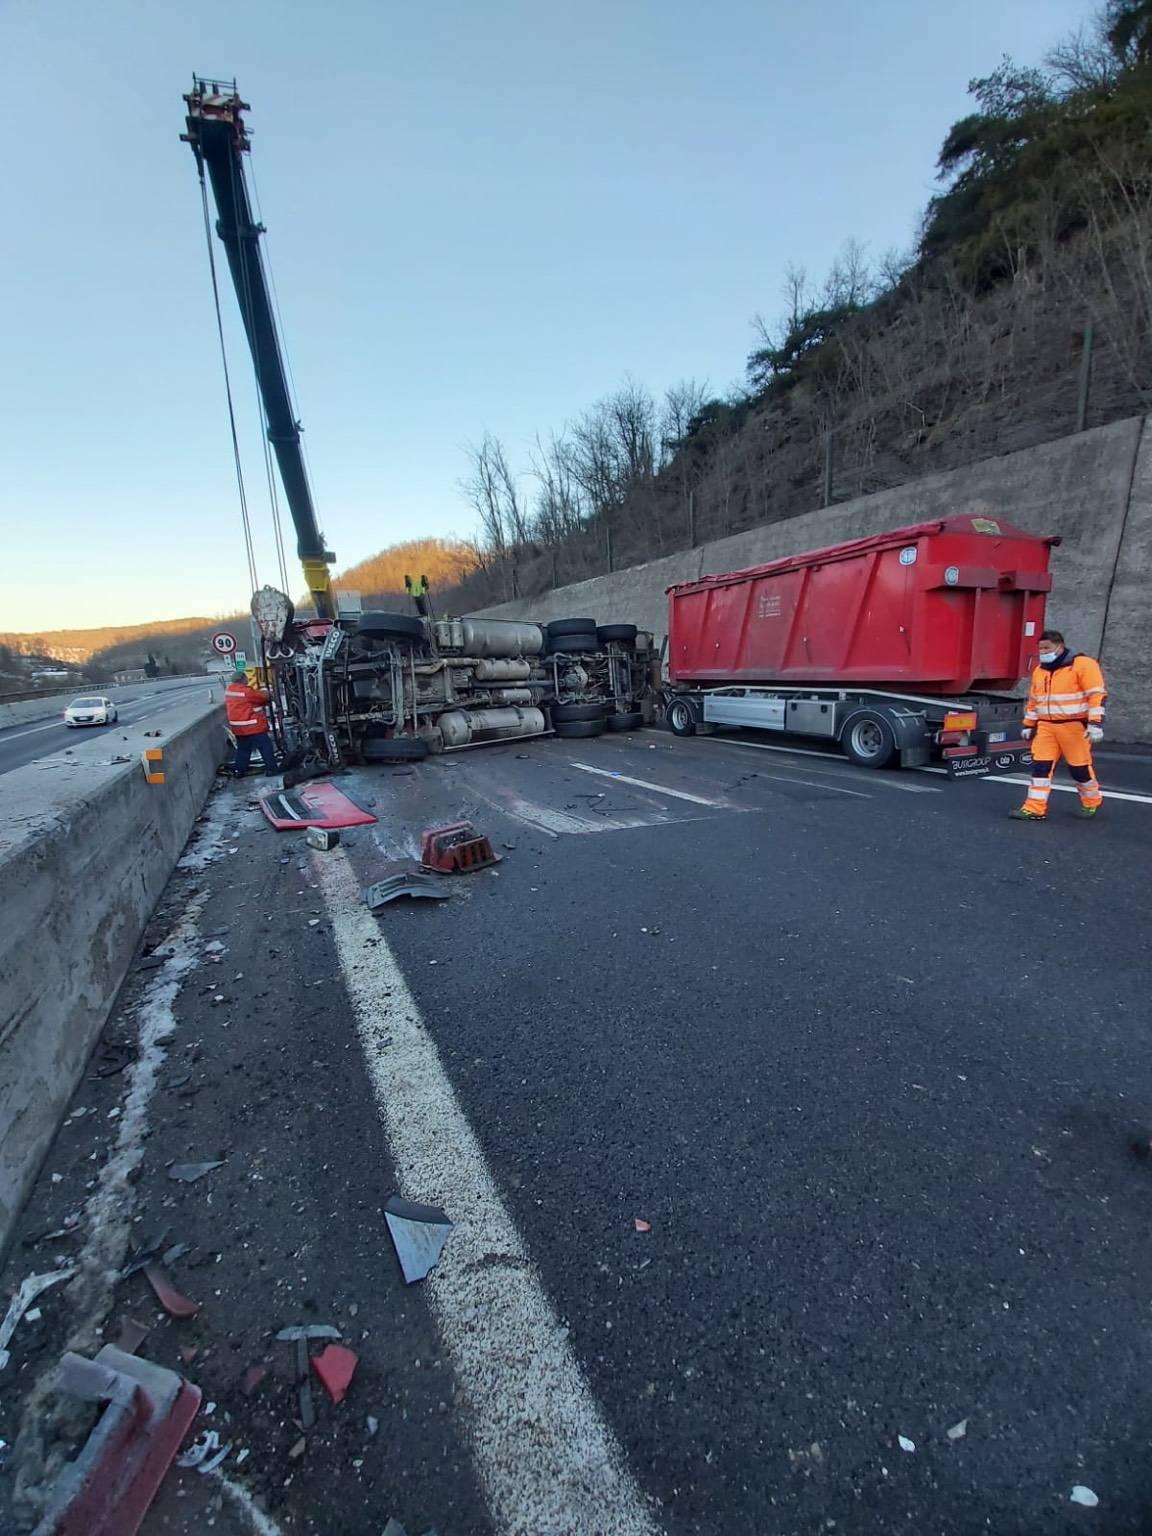 camion ribaltato rovesciato bilico autostrada6